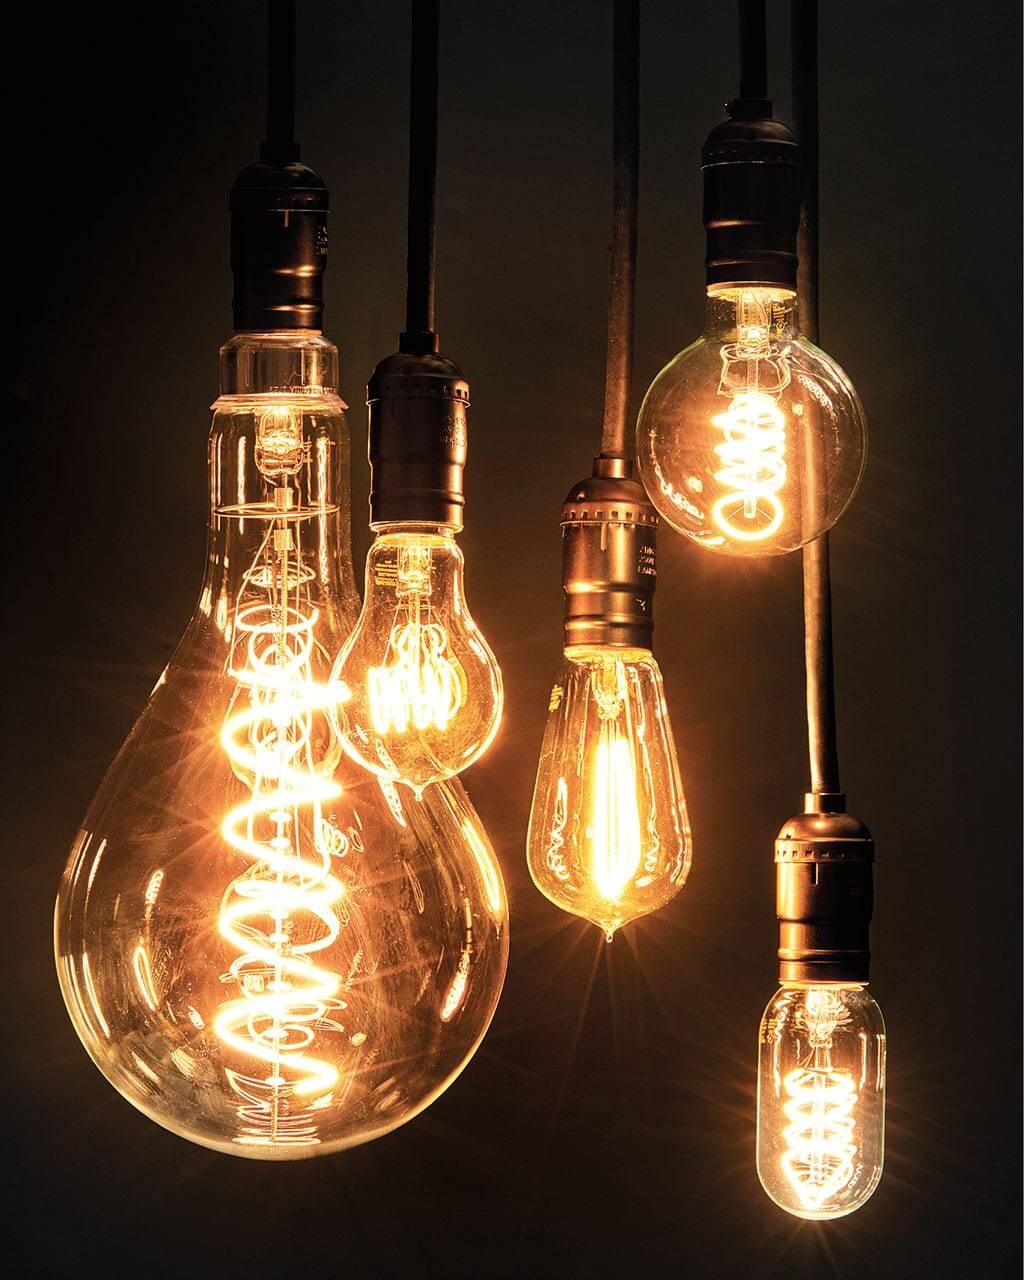 UVC LED需求攀升,光鋐下半年营收持续升温